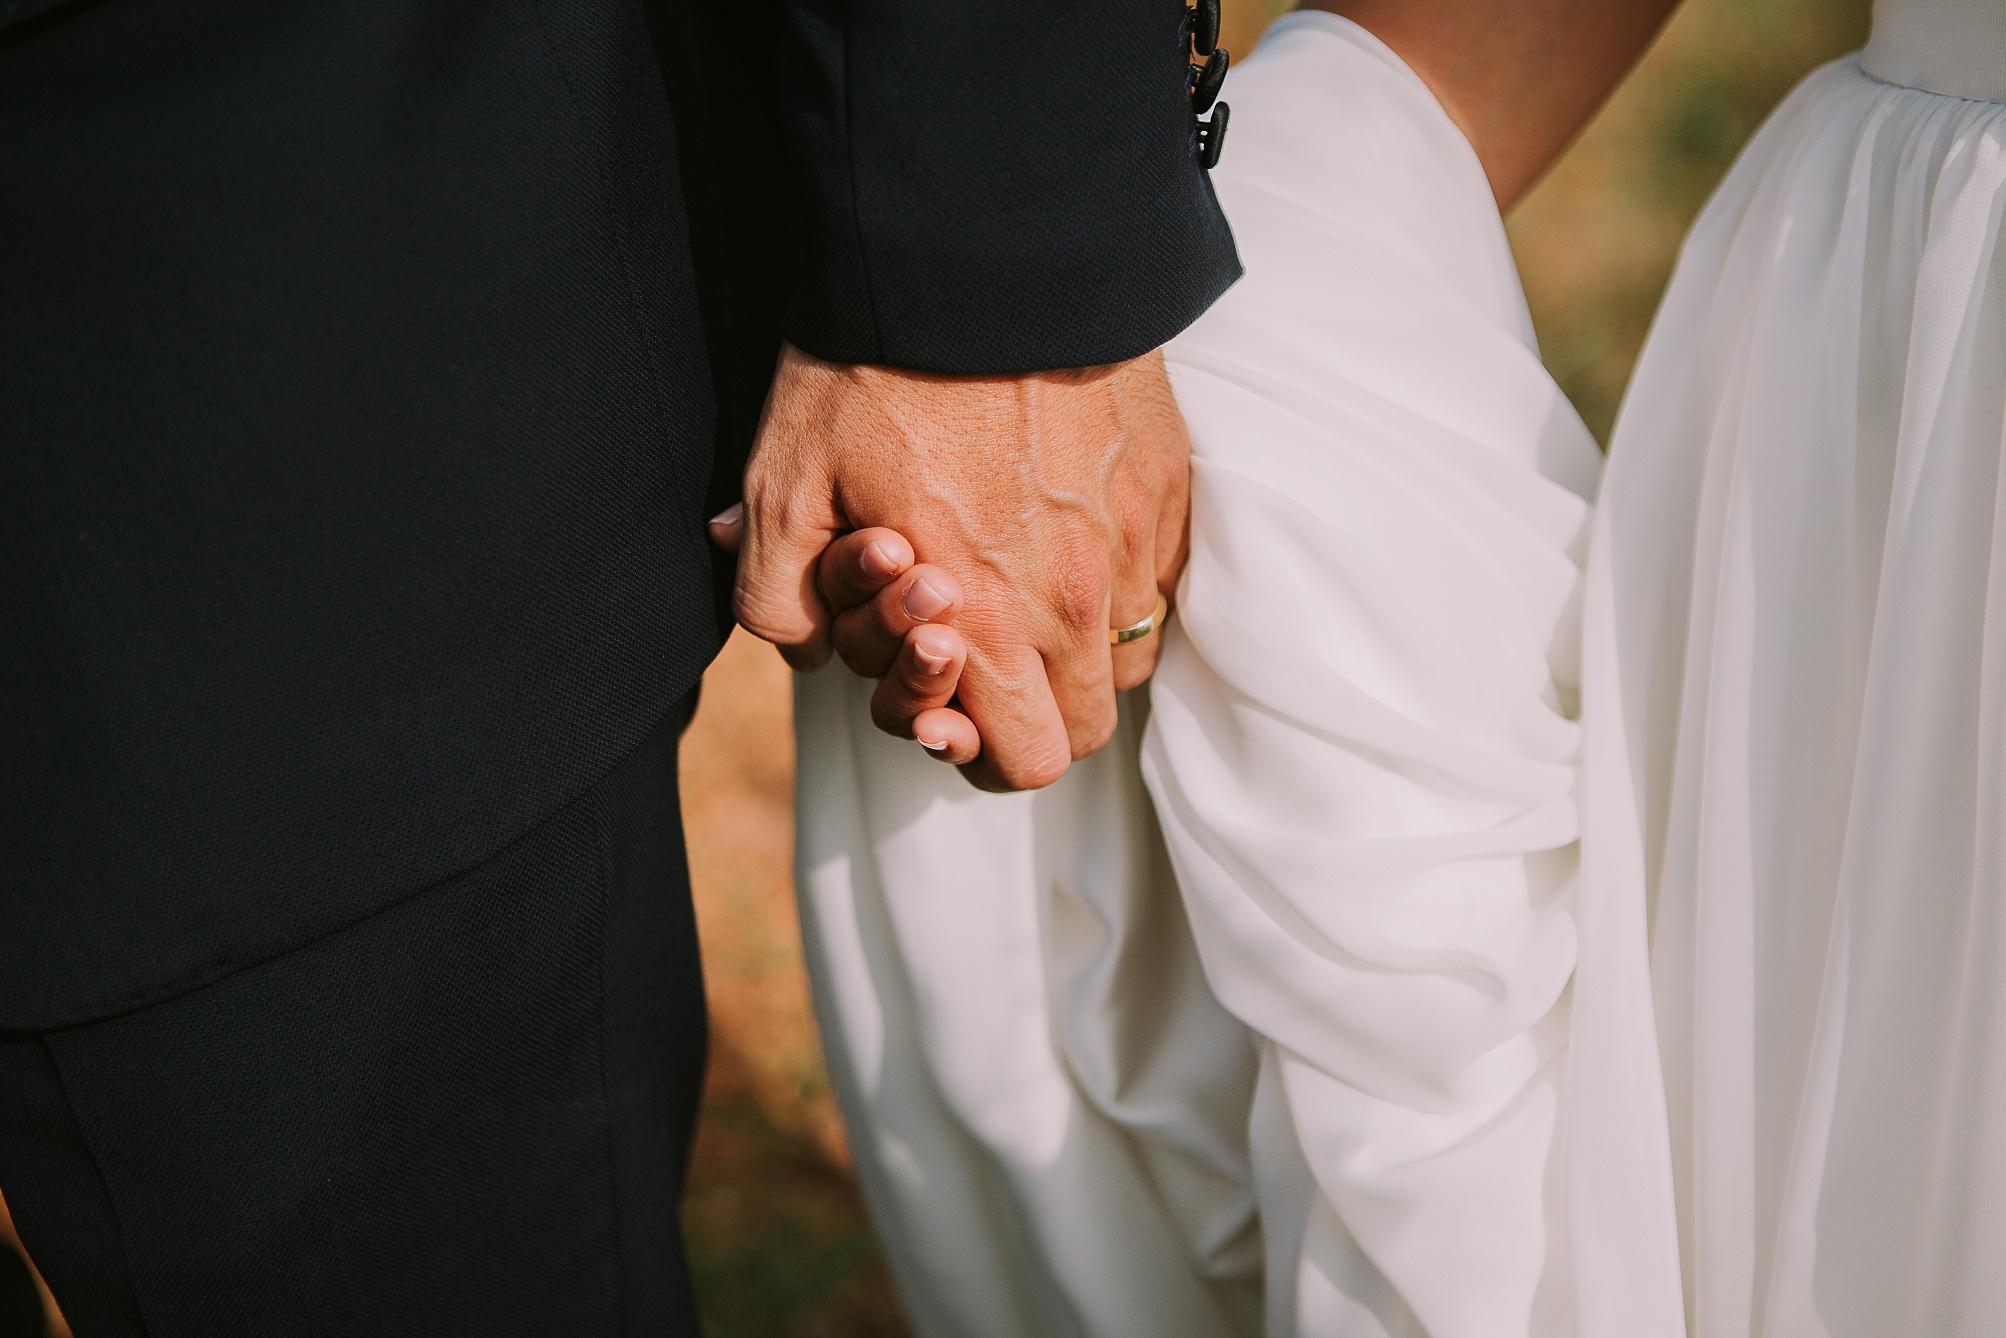 katerynaphotos-mariage-photographe-puyloubier-provence-aix-en-provence-sud-de-la-france_0403.jpg